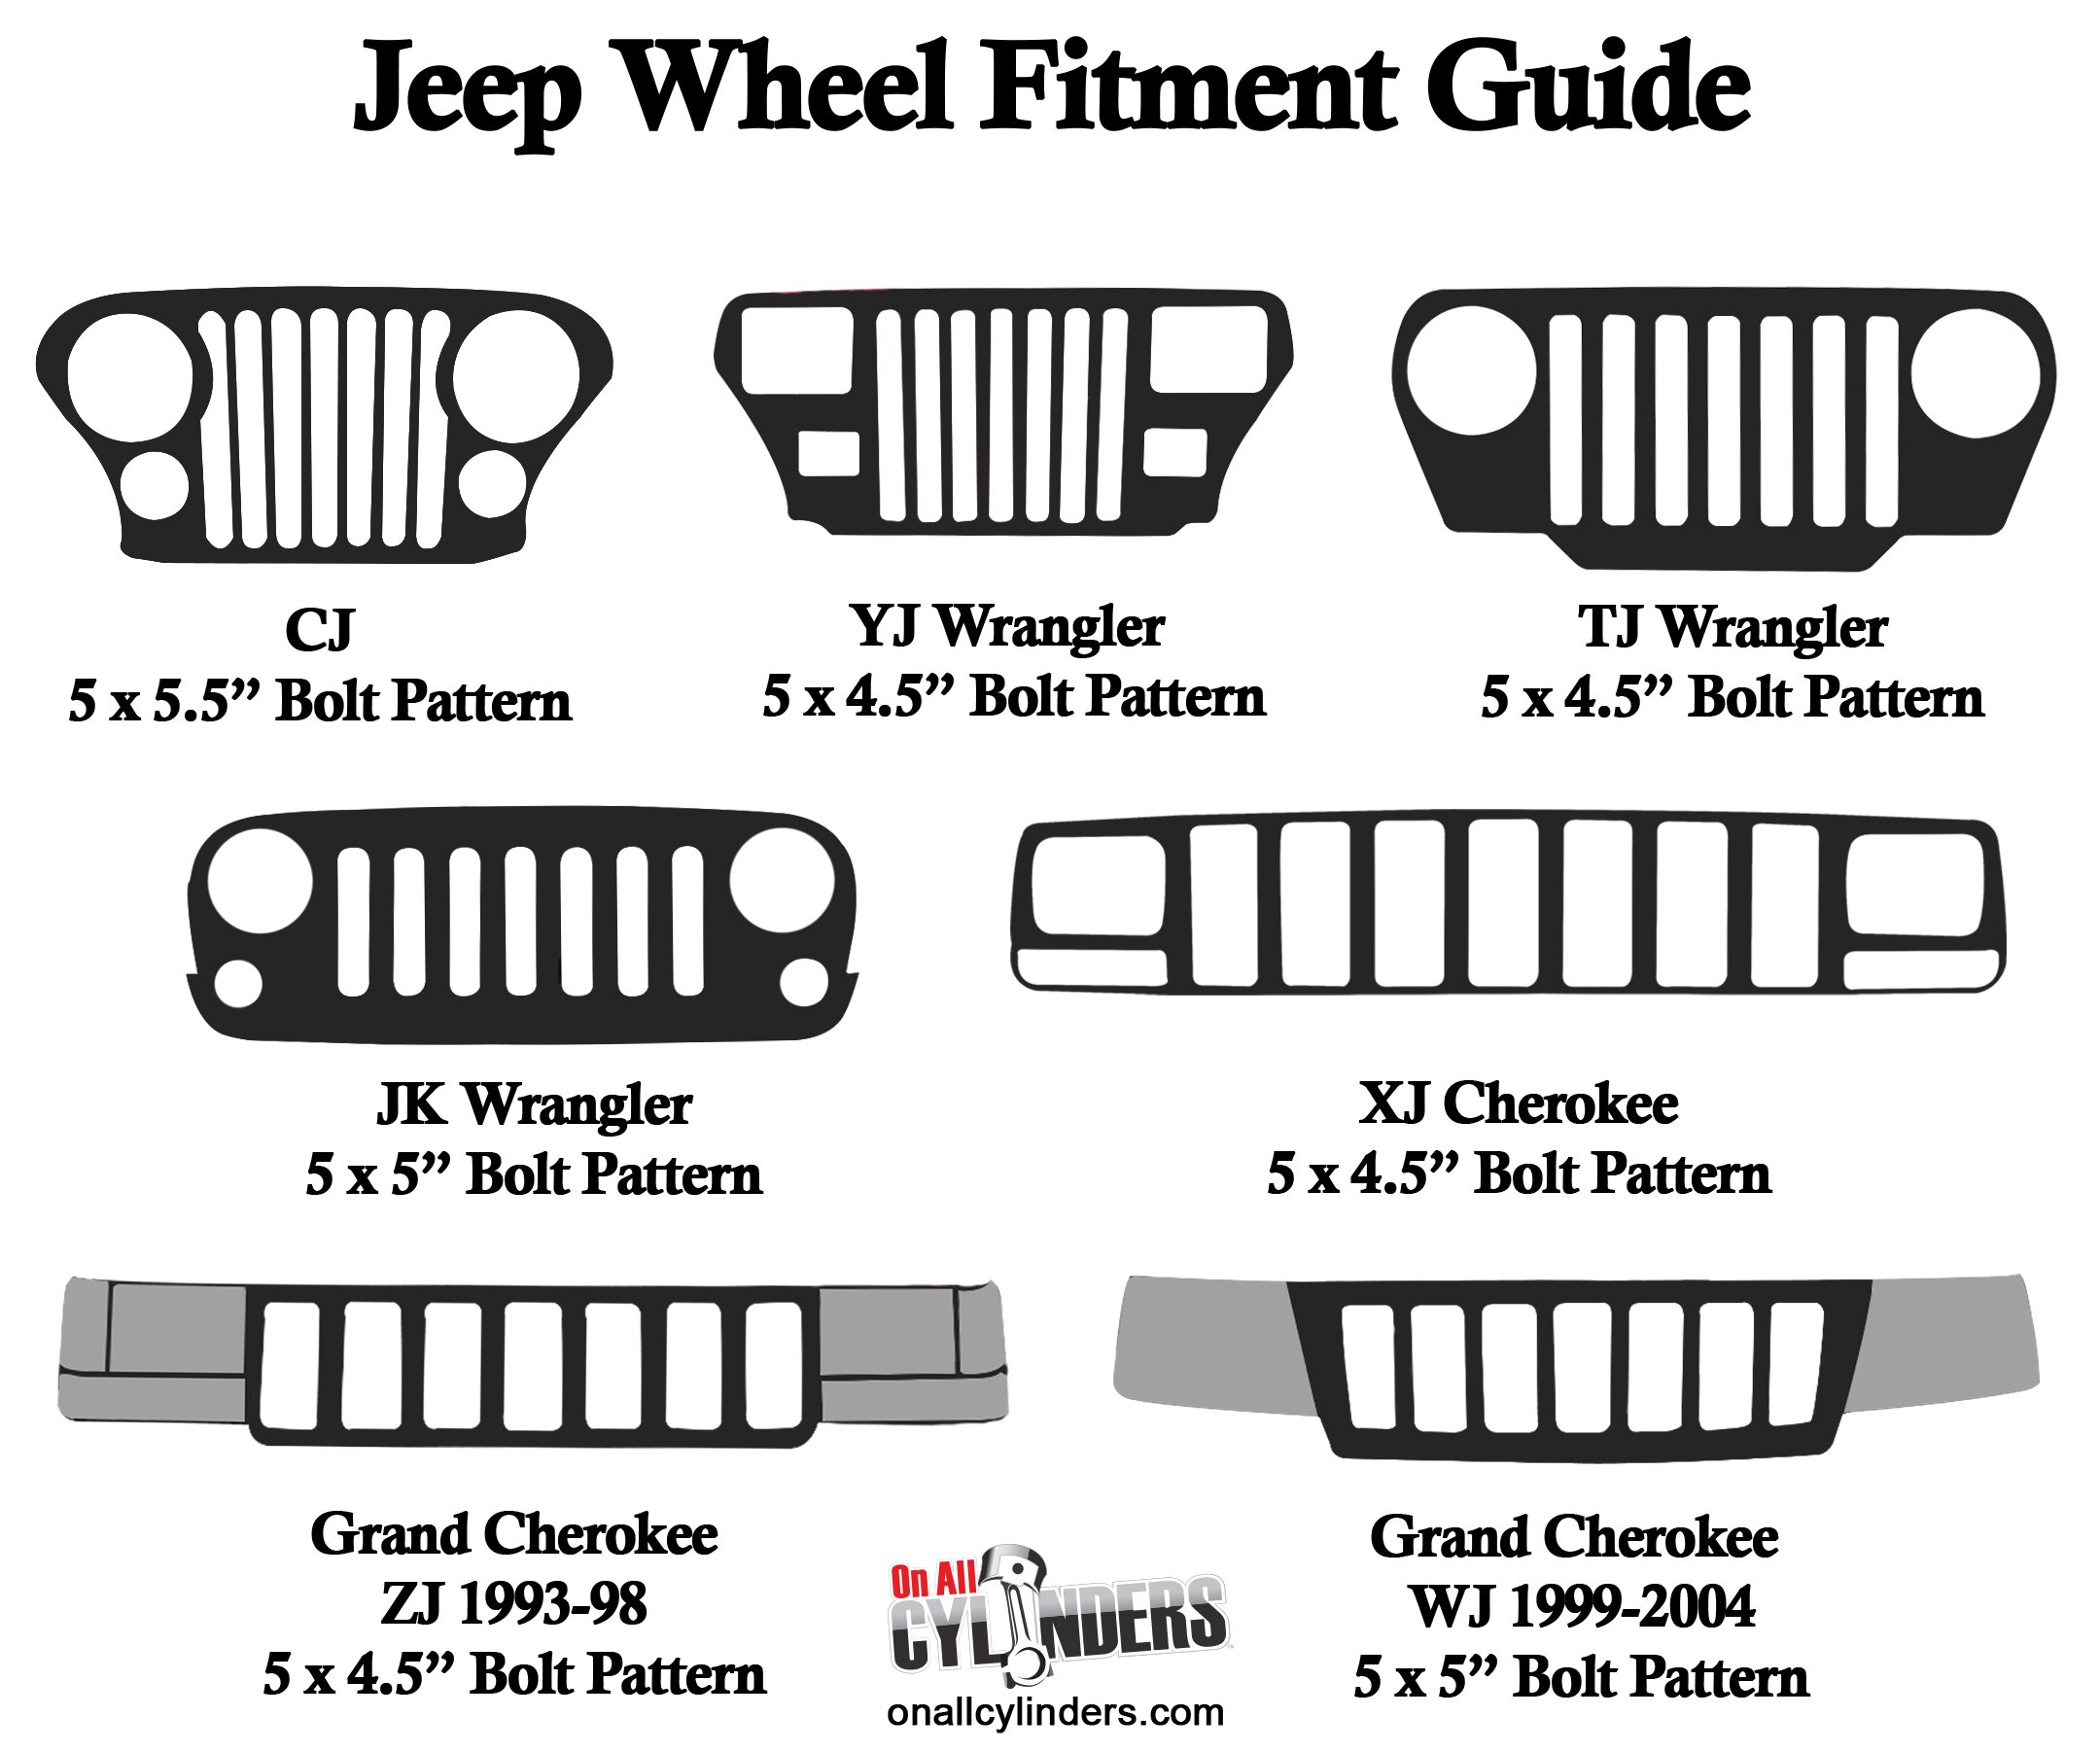 Chevy wheel bolt pattern chart lug nut torque specs dodge ram forum truck forums also heartpulsar rh